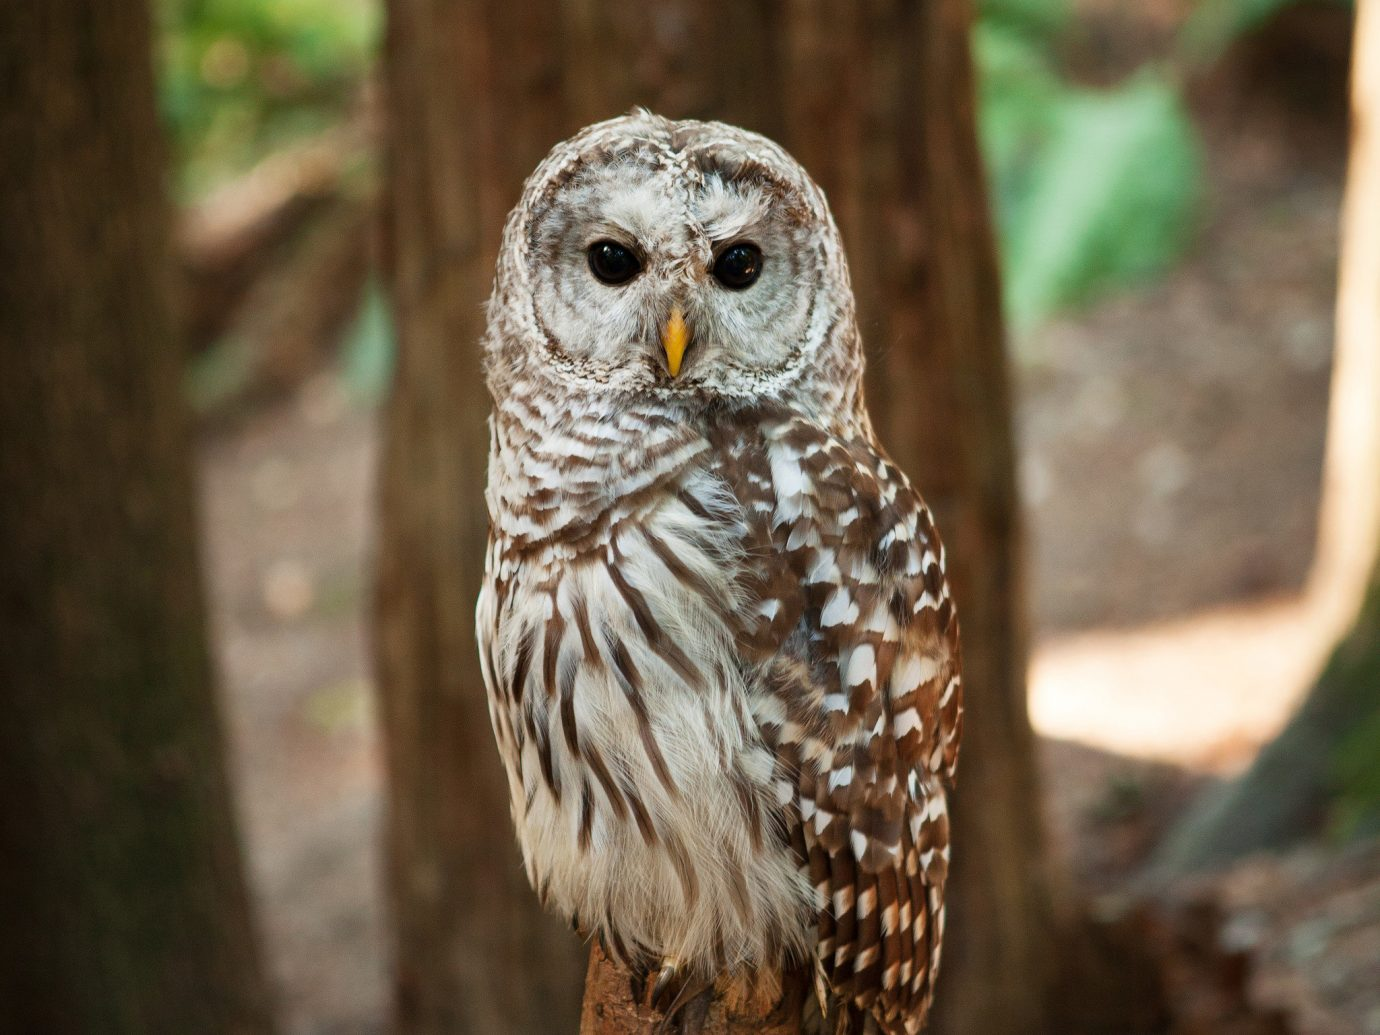 Trip Ideas tree owl bird of prey outdoor Bird animal Nature beak vertebrate Wildlife fauna zoo wood close trunk stone